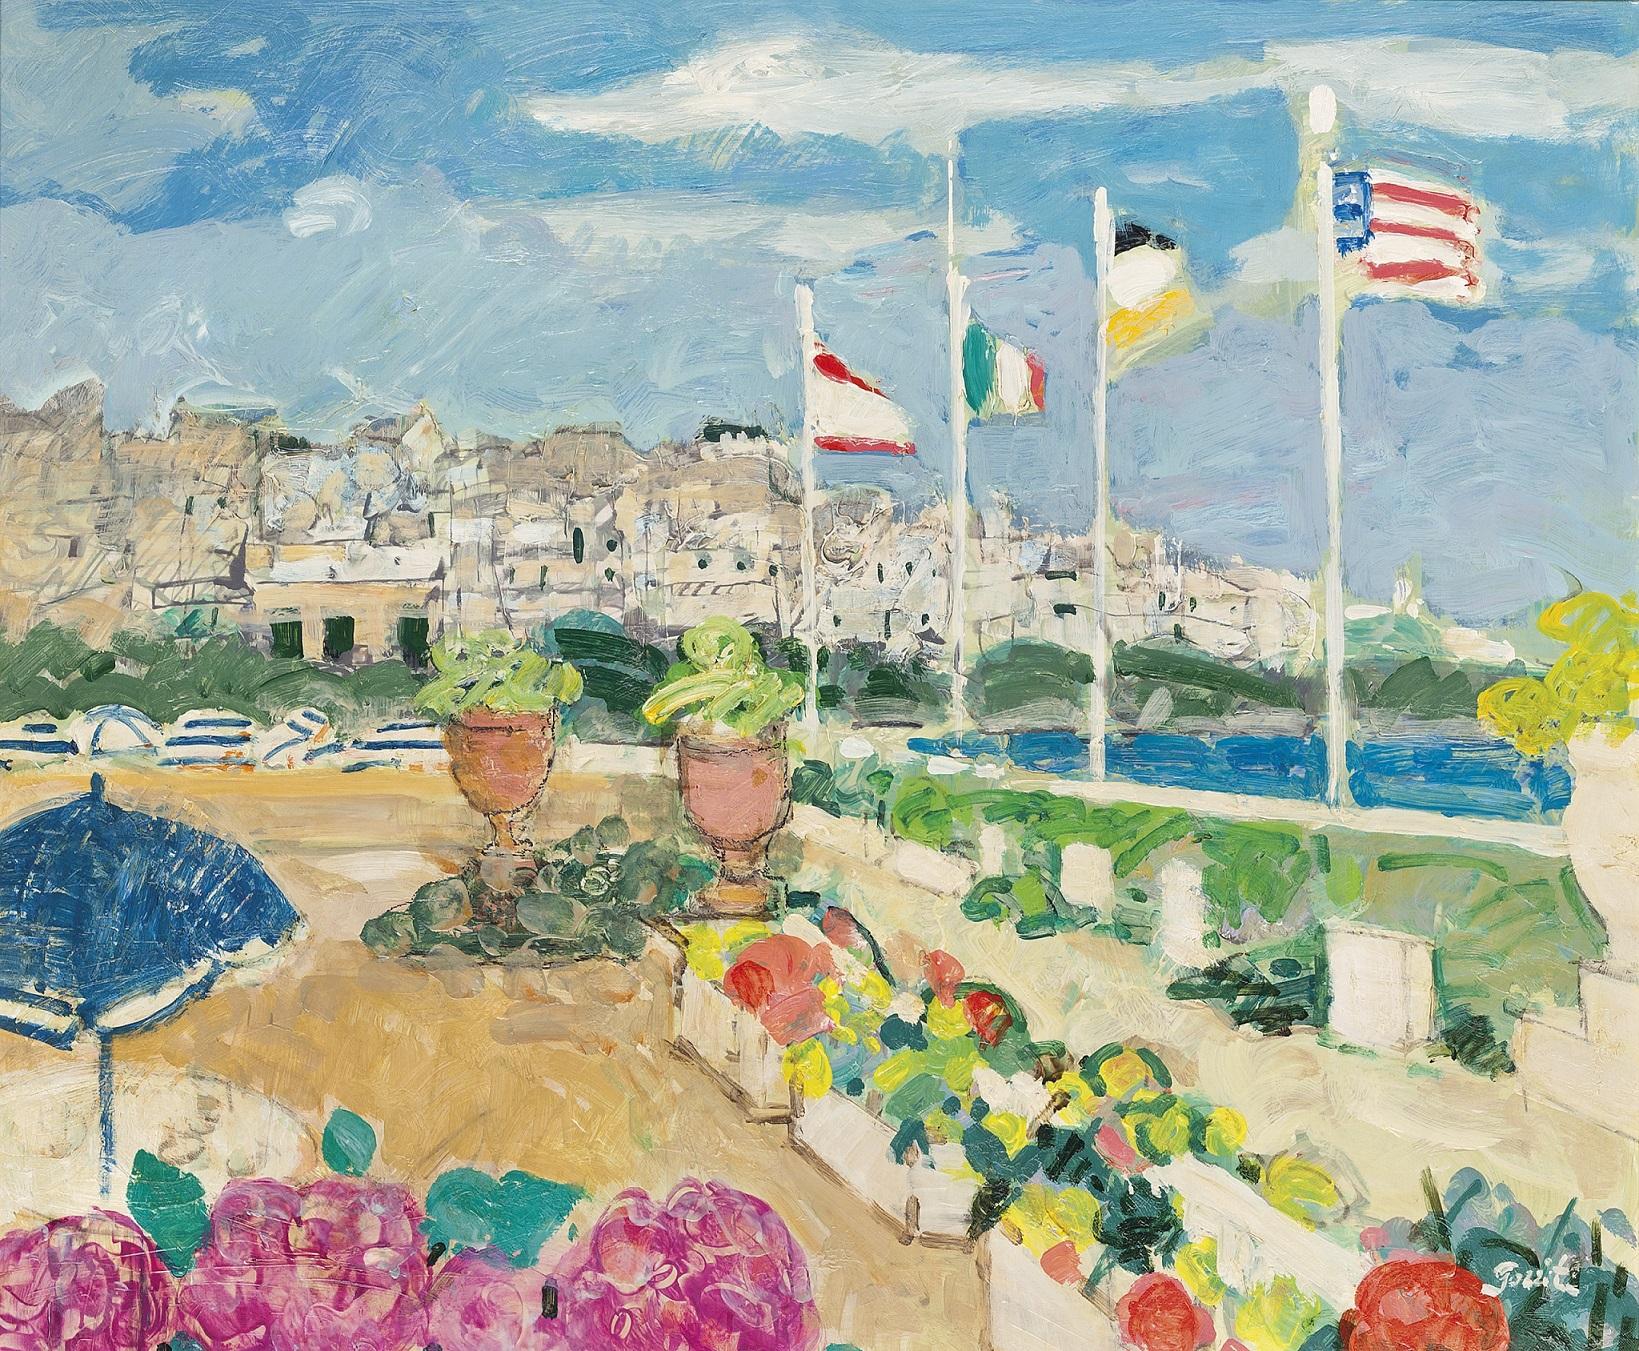 Gilles Gorriti, Biarritz